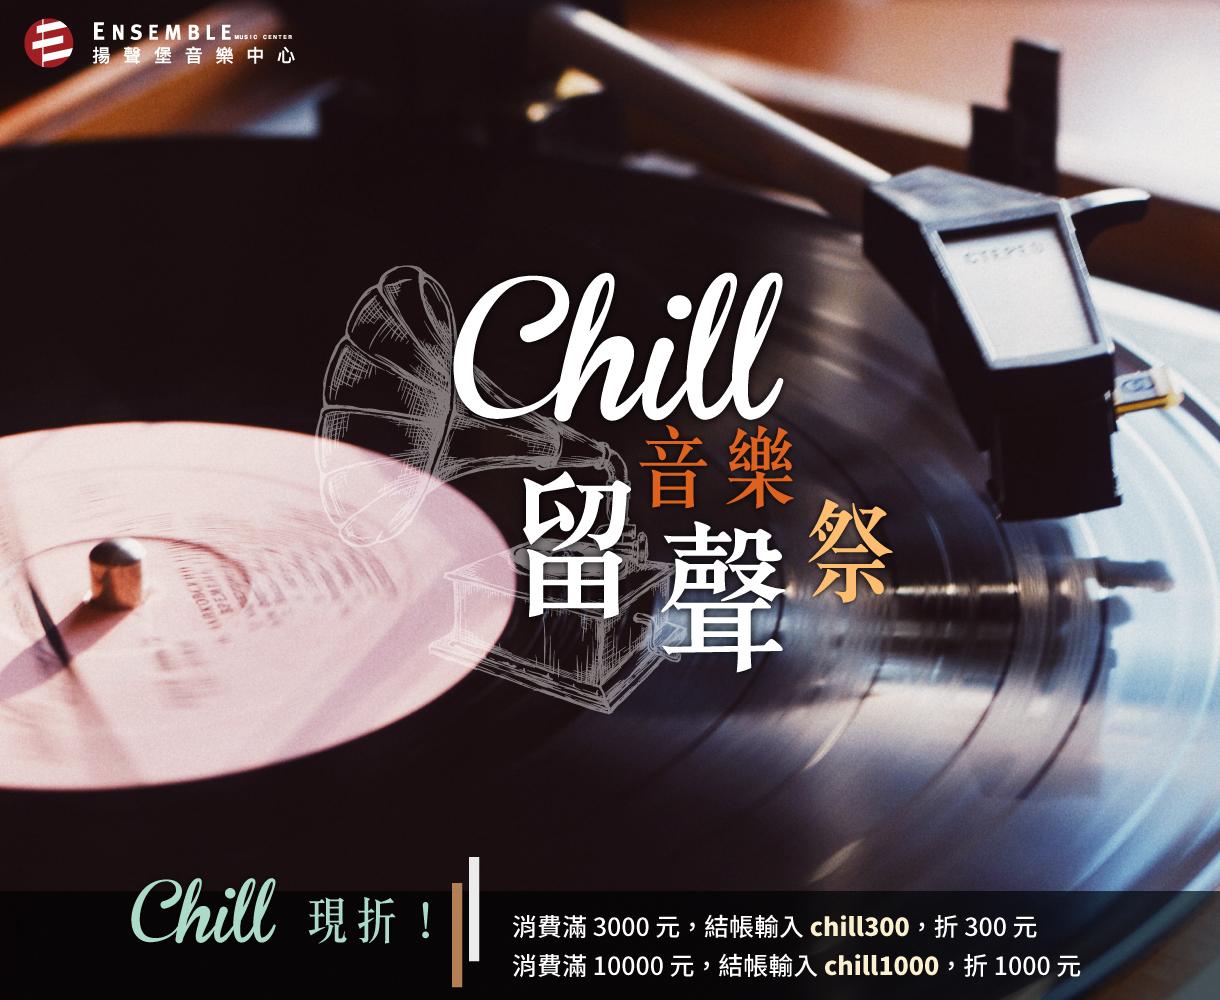 Chill2020